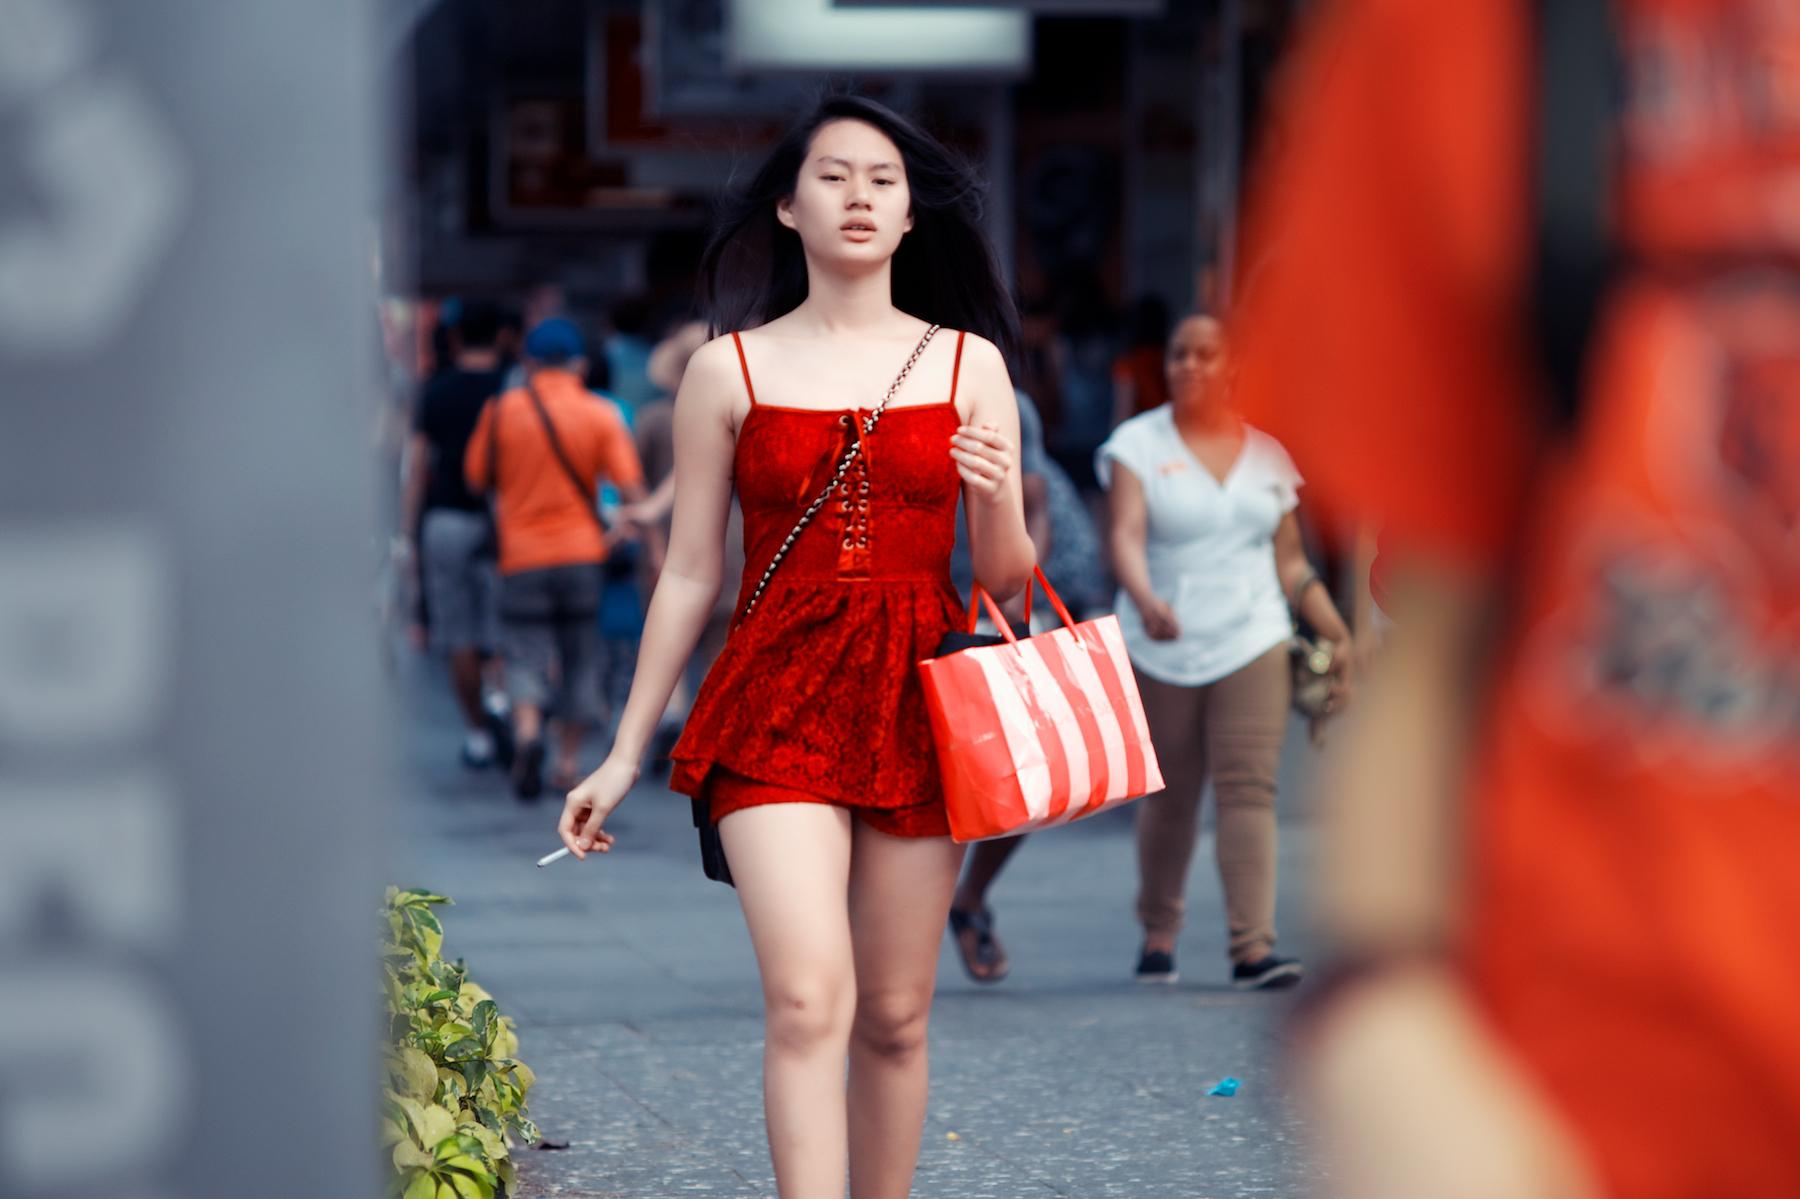 Wallpaper  Singapore, Red, Smoke, Smoking, Dress, Nikon -6411